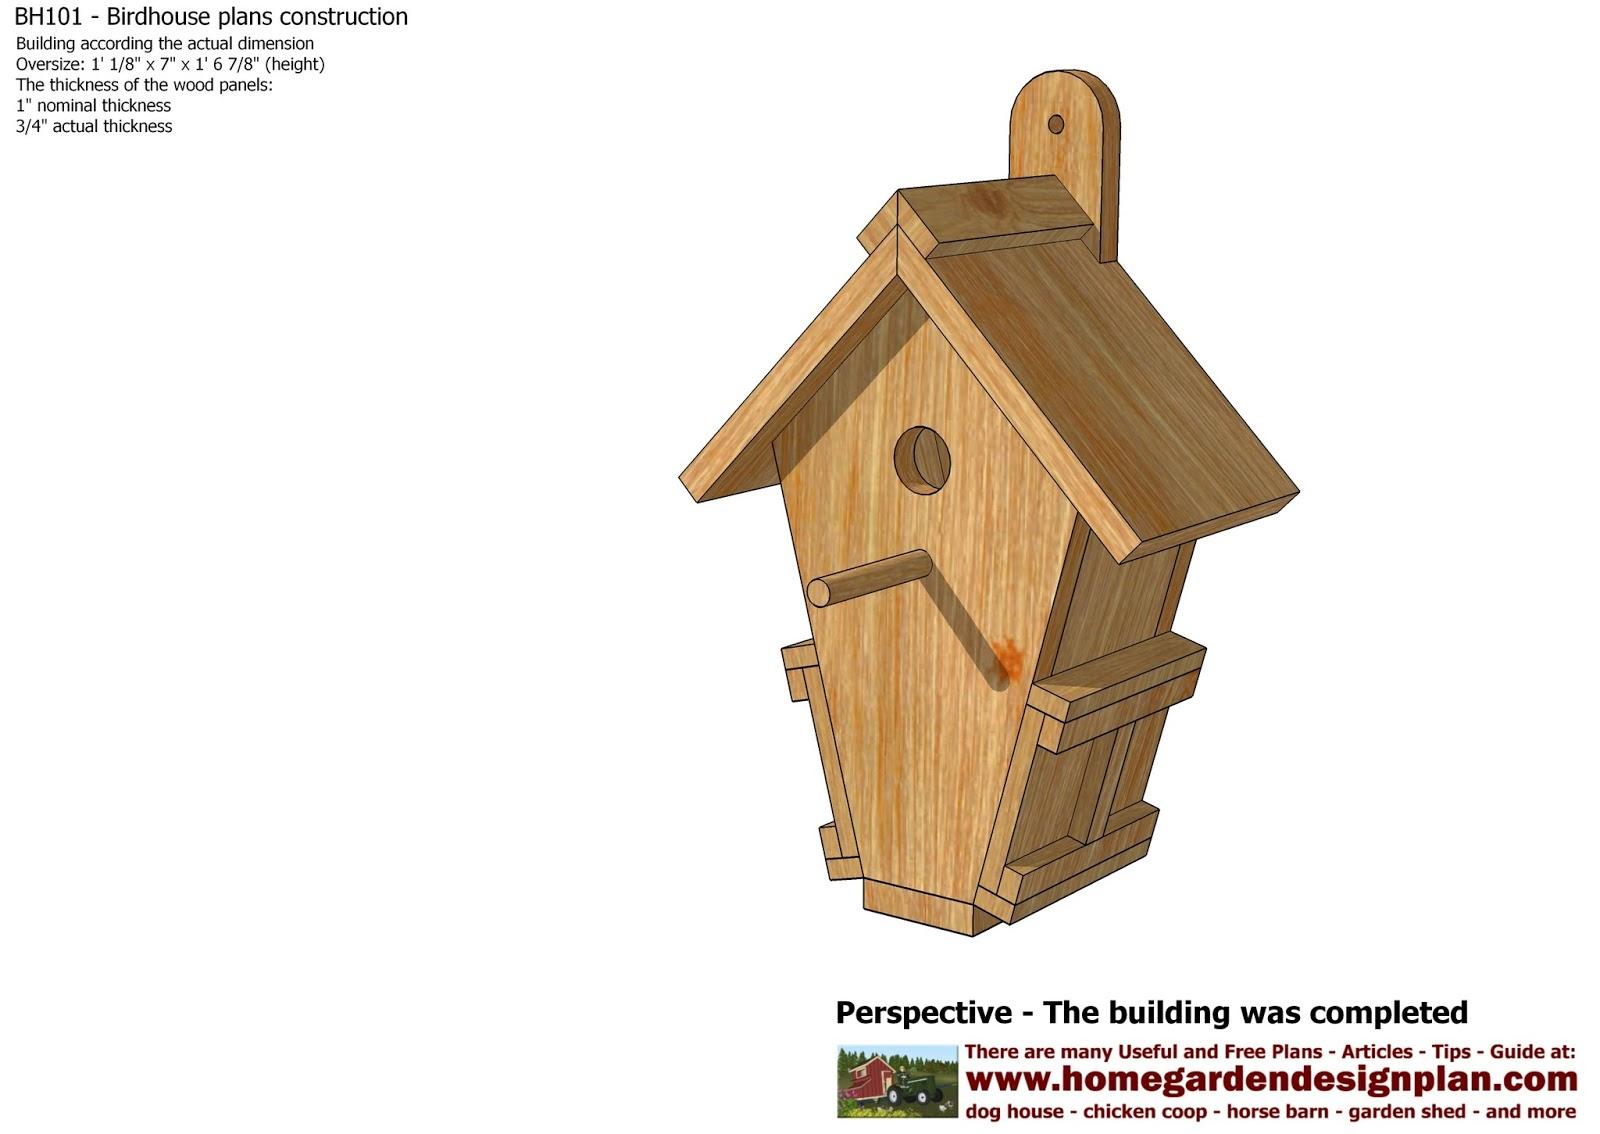 How To Build A Birdhouse Plans